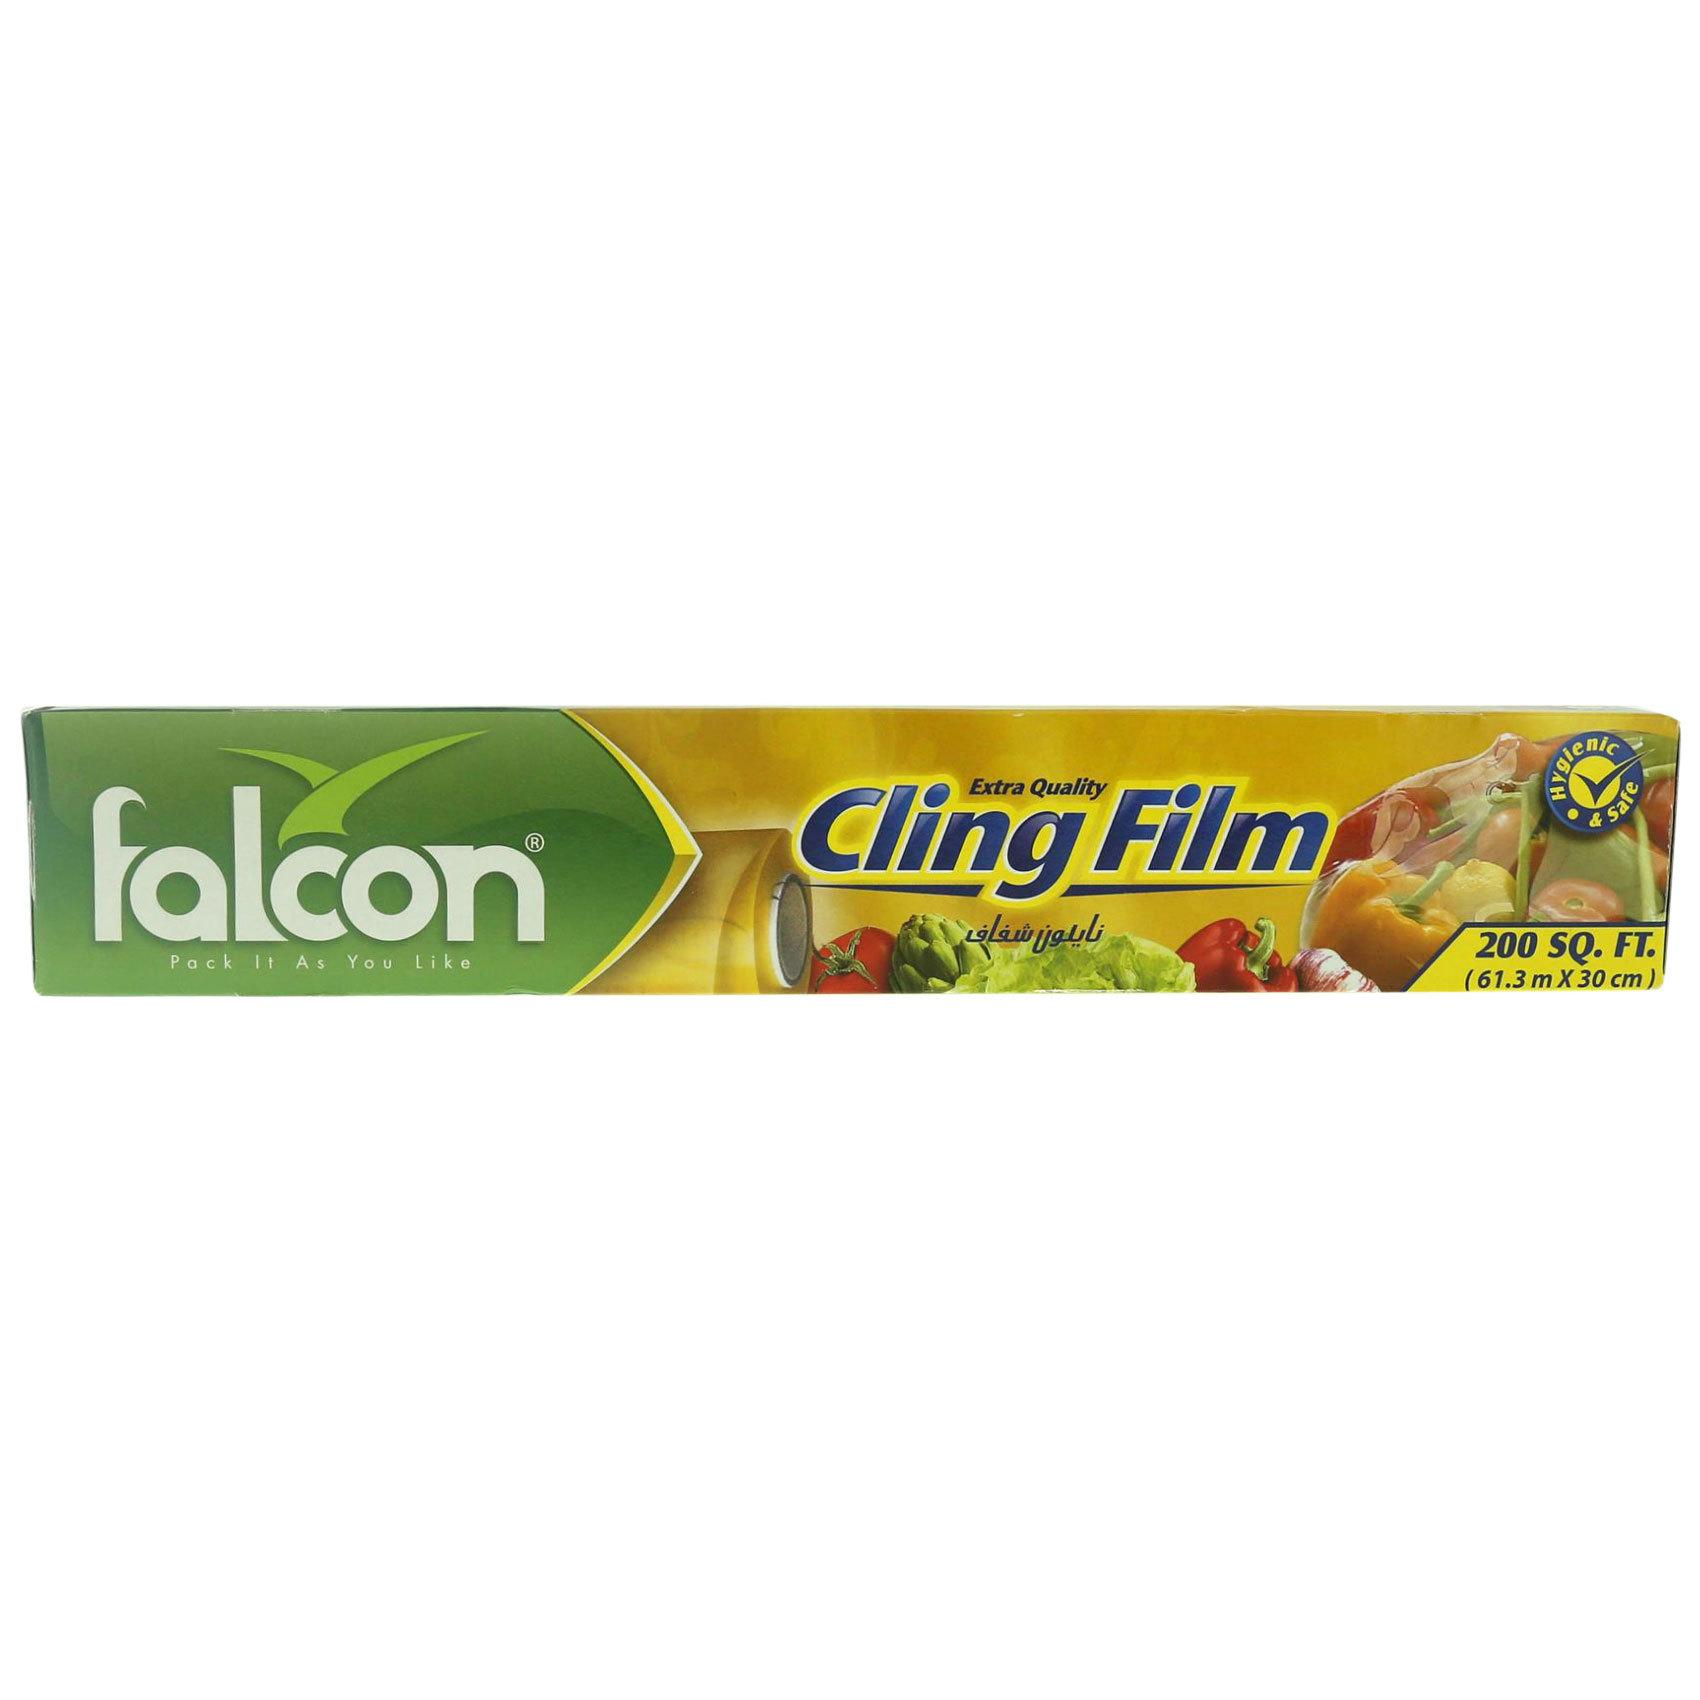 FALCON CLING FILM 200 SQFT